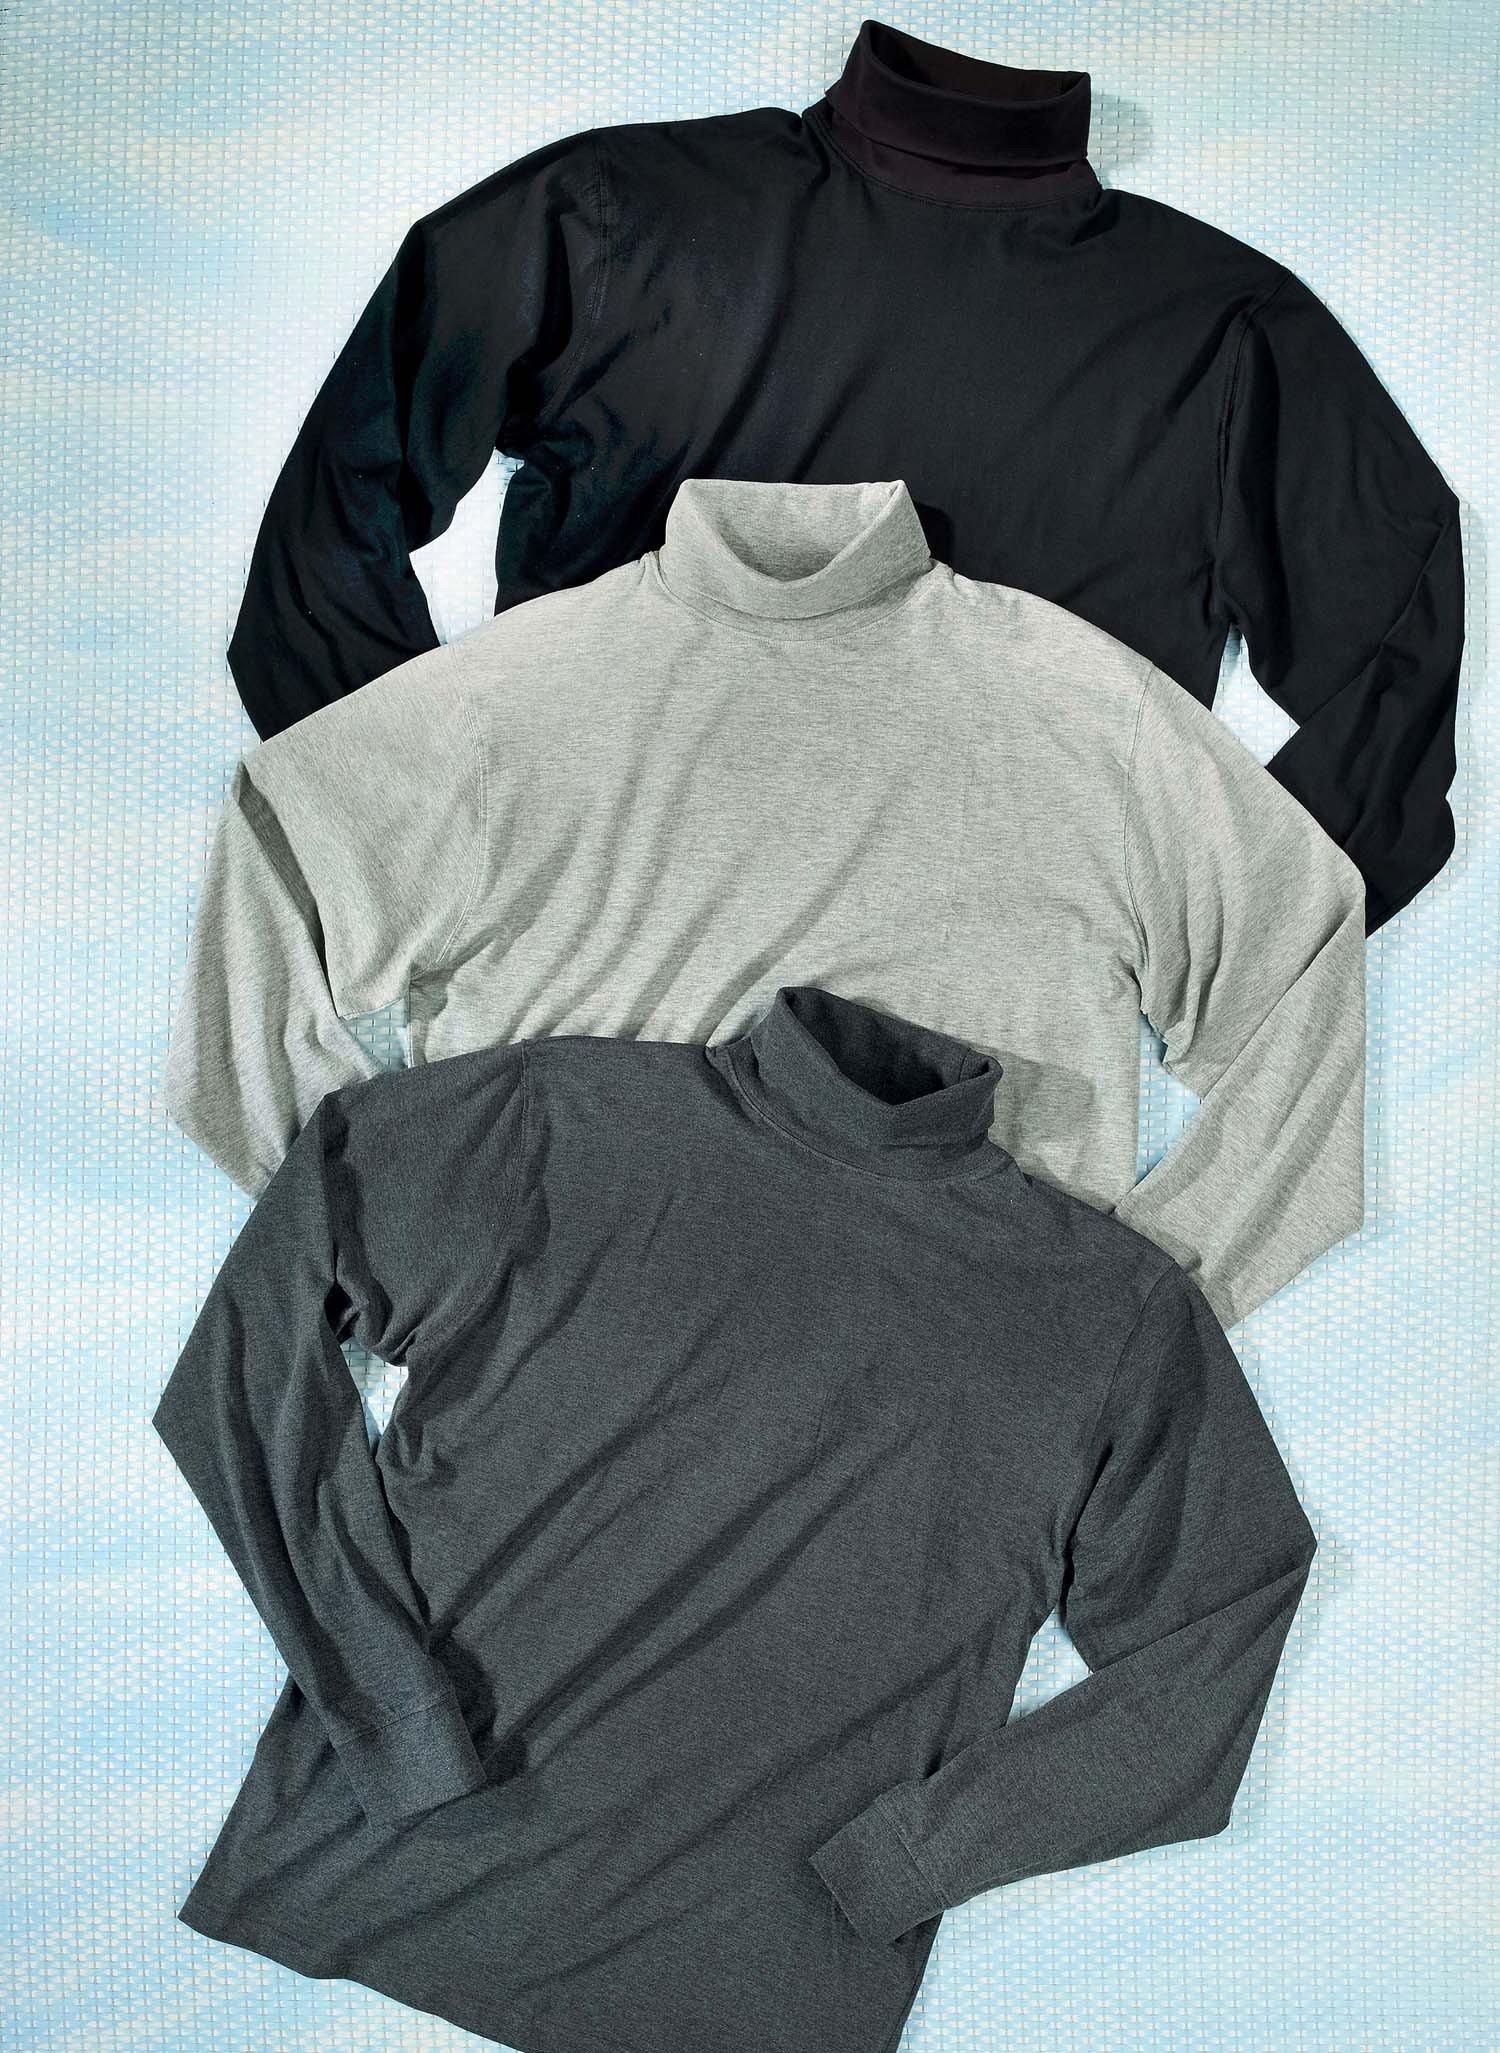 H-LA-Rolli-Shirt schwarz L 010 - 2 - Ronja.ch